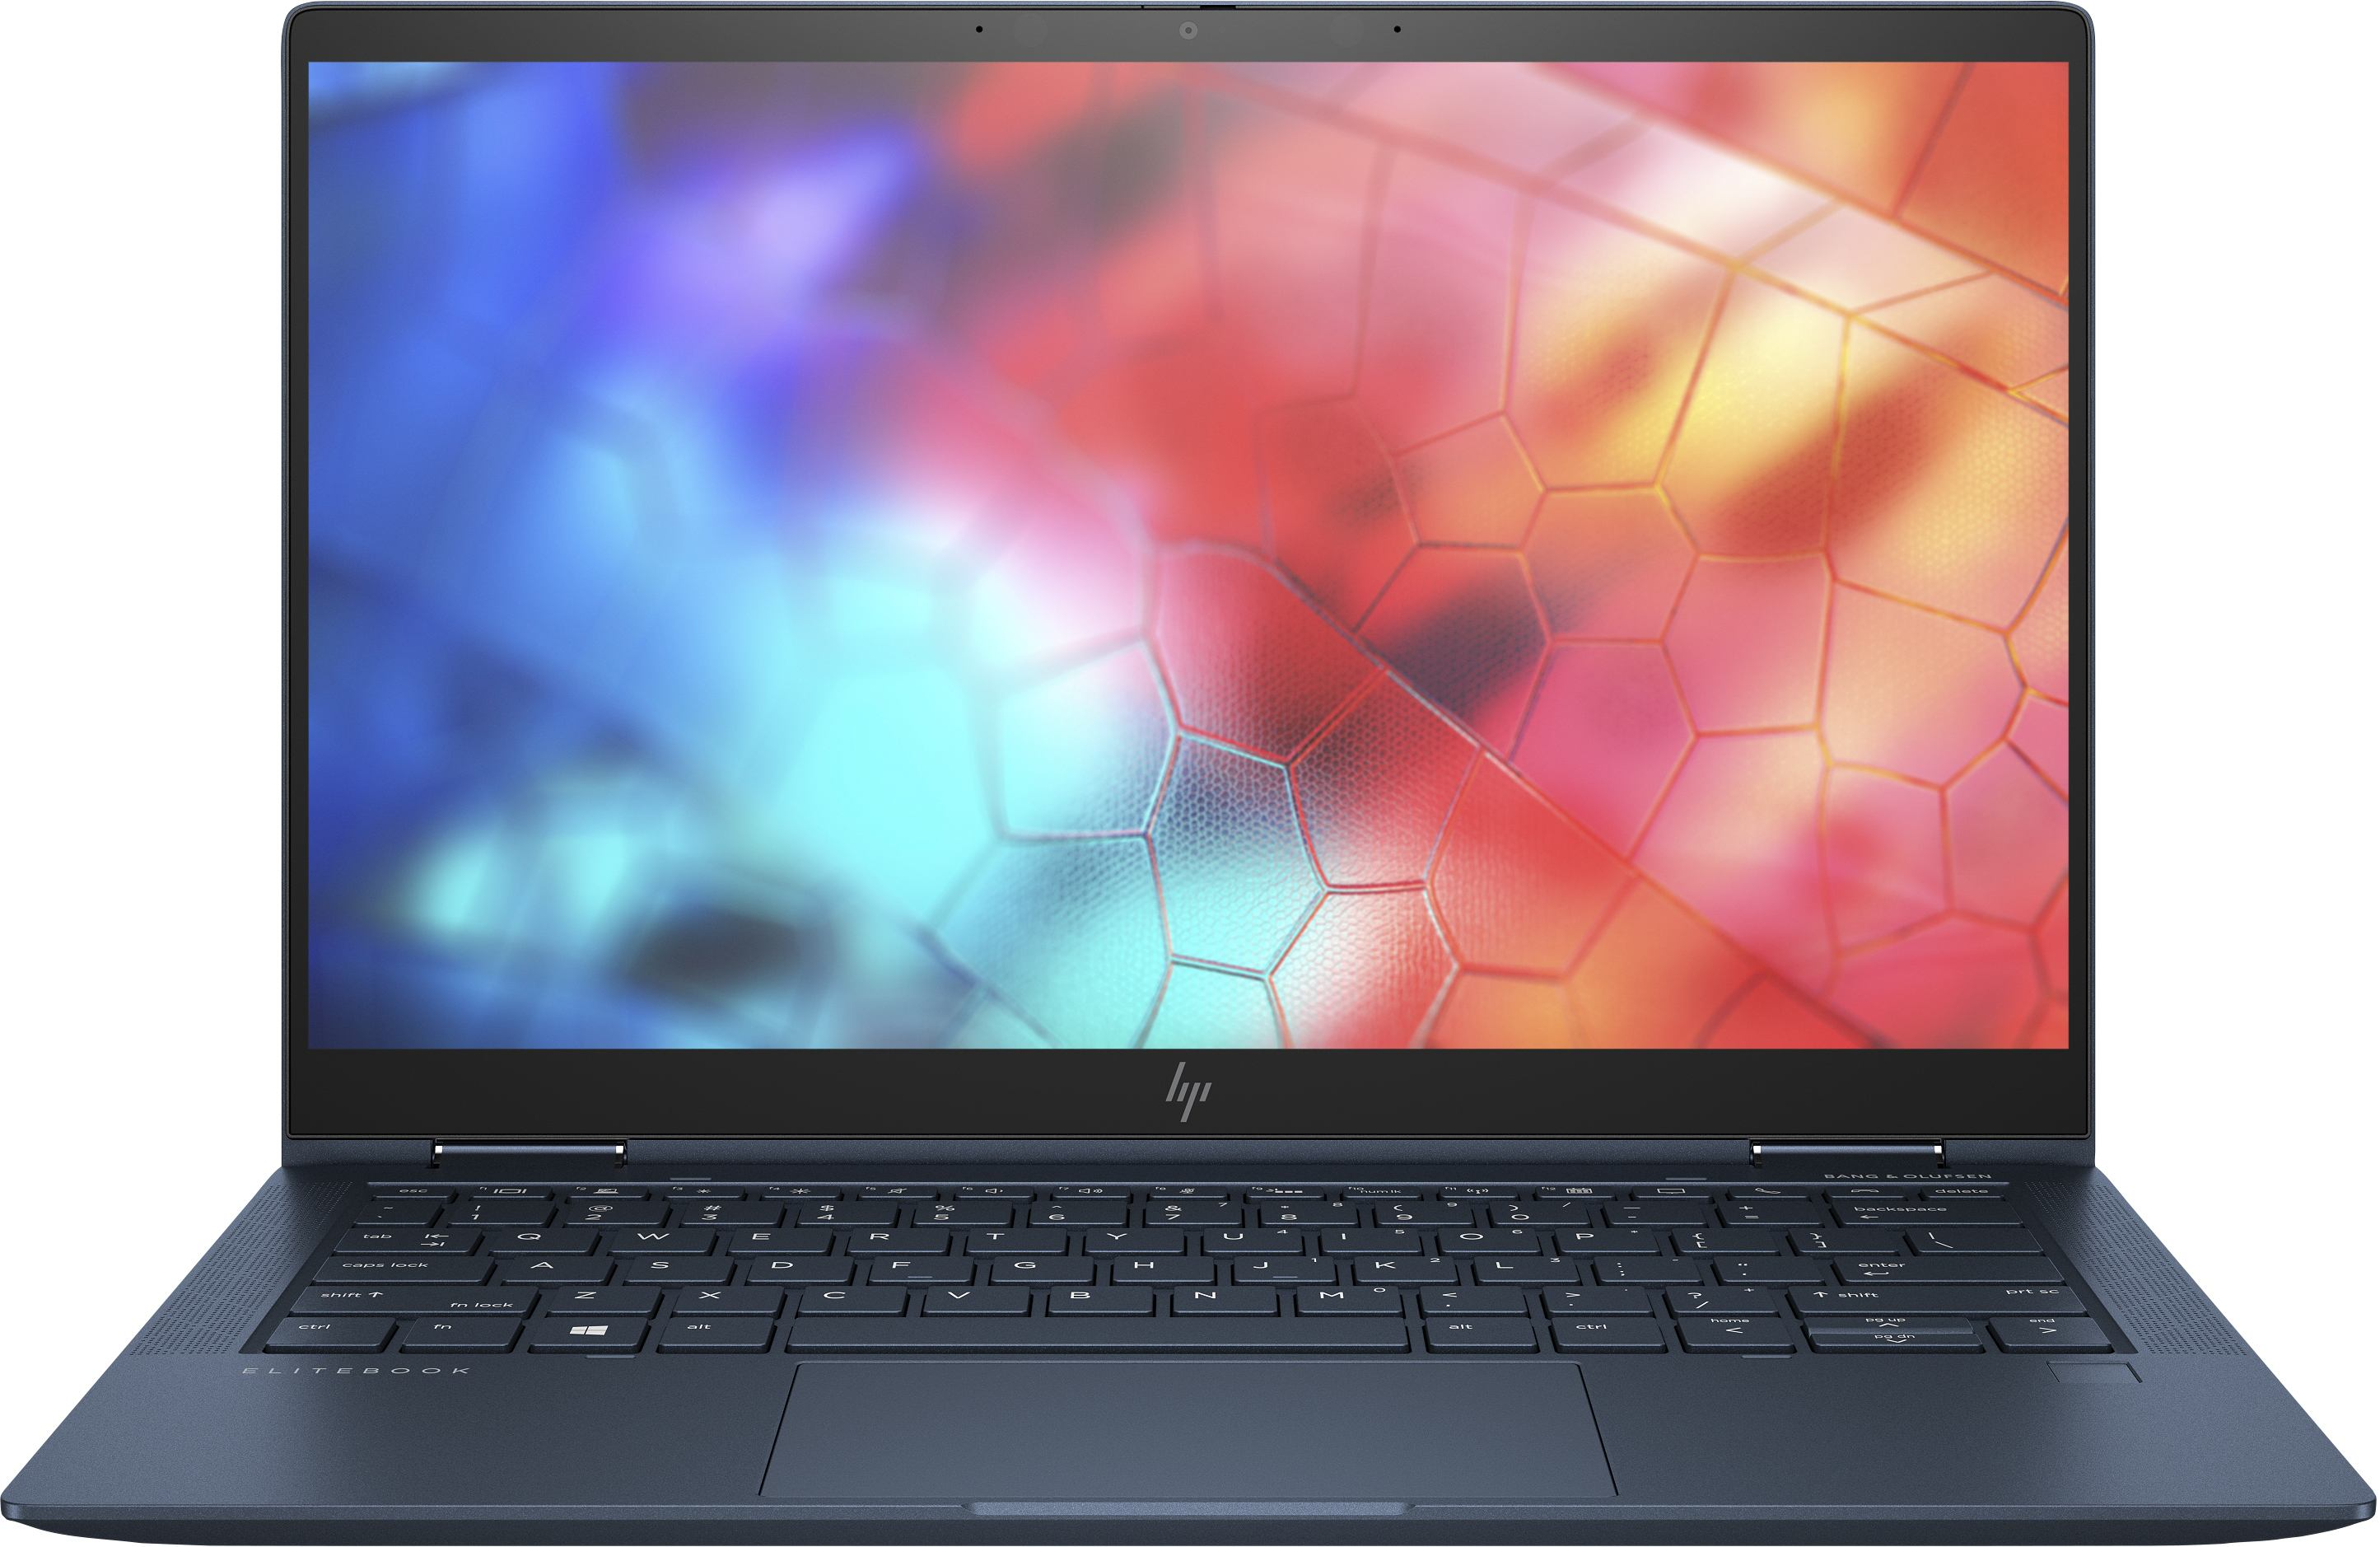 2022274-HP-Elite-Dragonfly-Nero-Ibrido-2-in-1-33-8-cm-13-3-1920-x-1080-Pixel